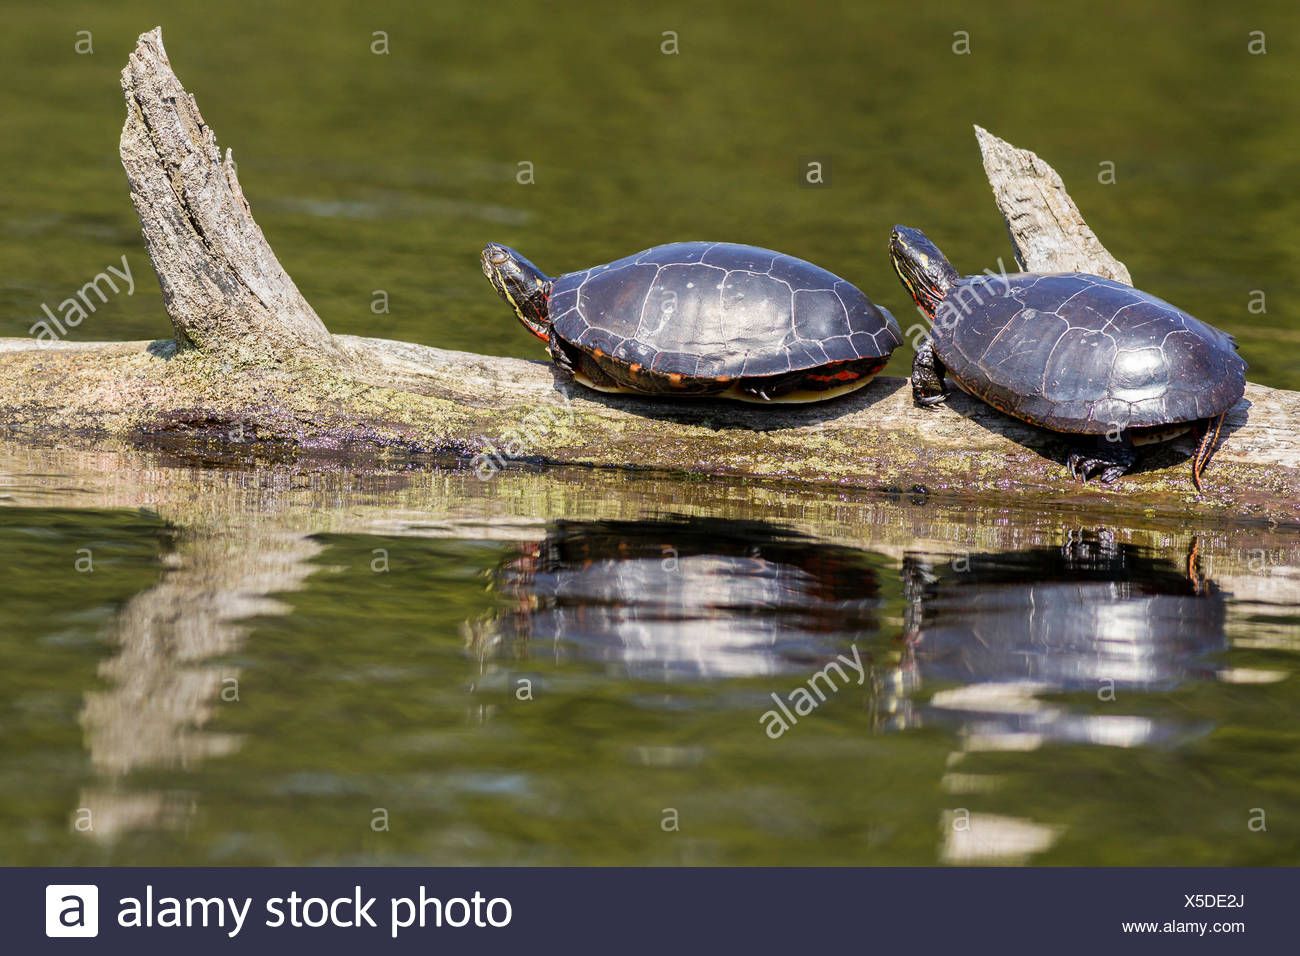 Midland Painted Turtles (Chrysemys picta marginata) sunning, Killarney Provincial Park, Ontario - Stock Image